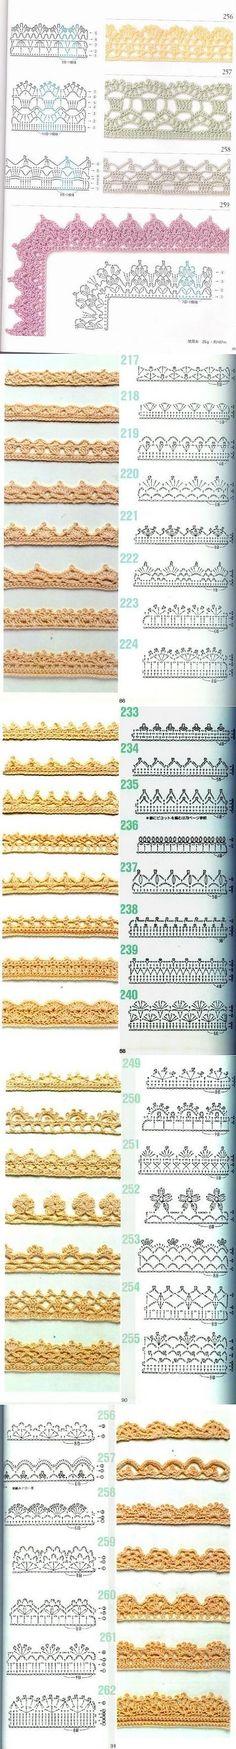 Various crochet border/edging free diagrams.